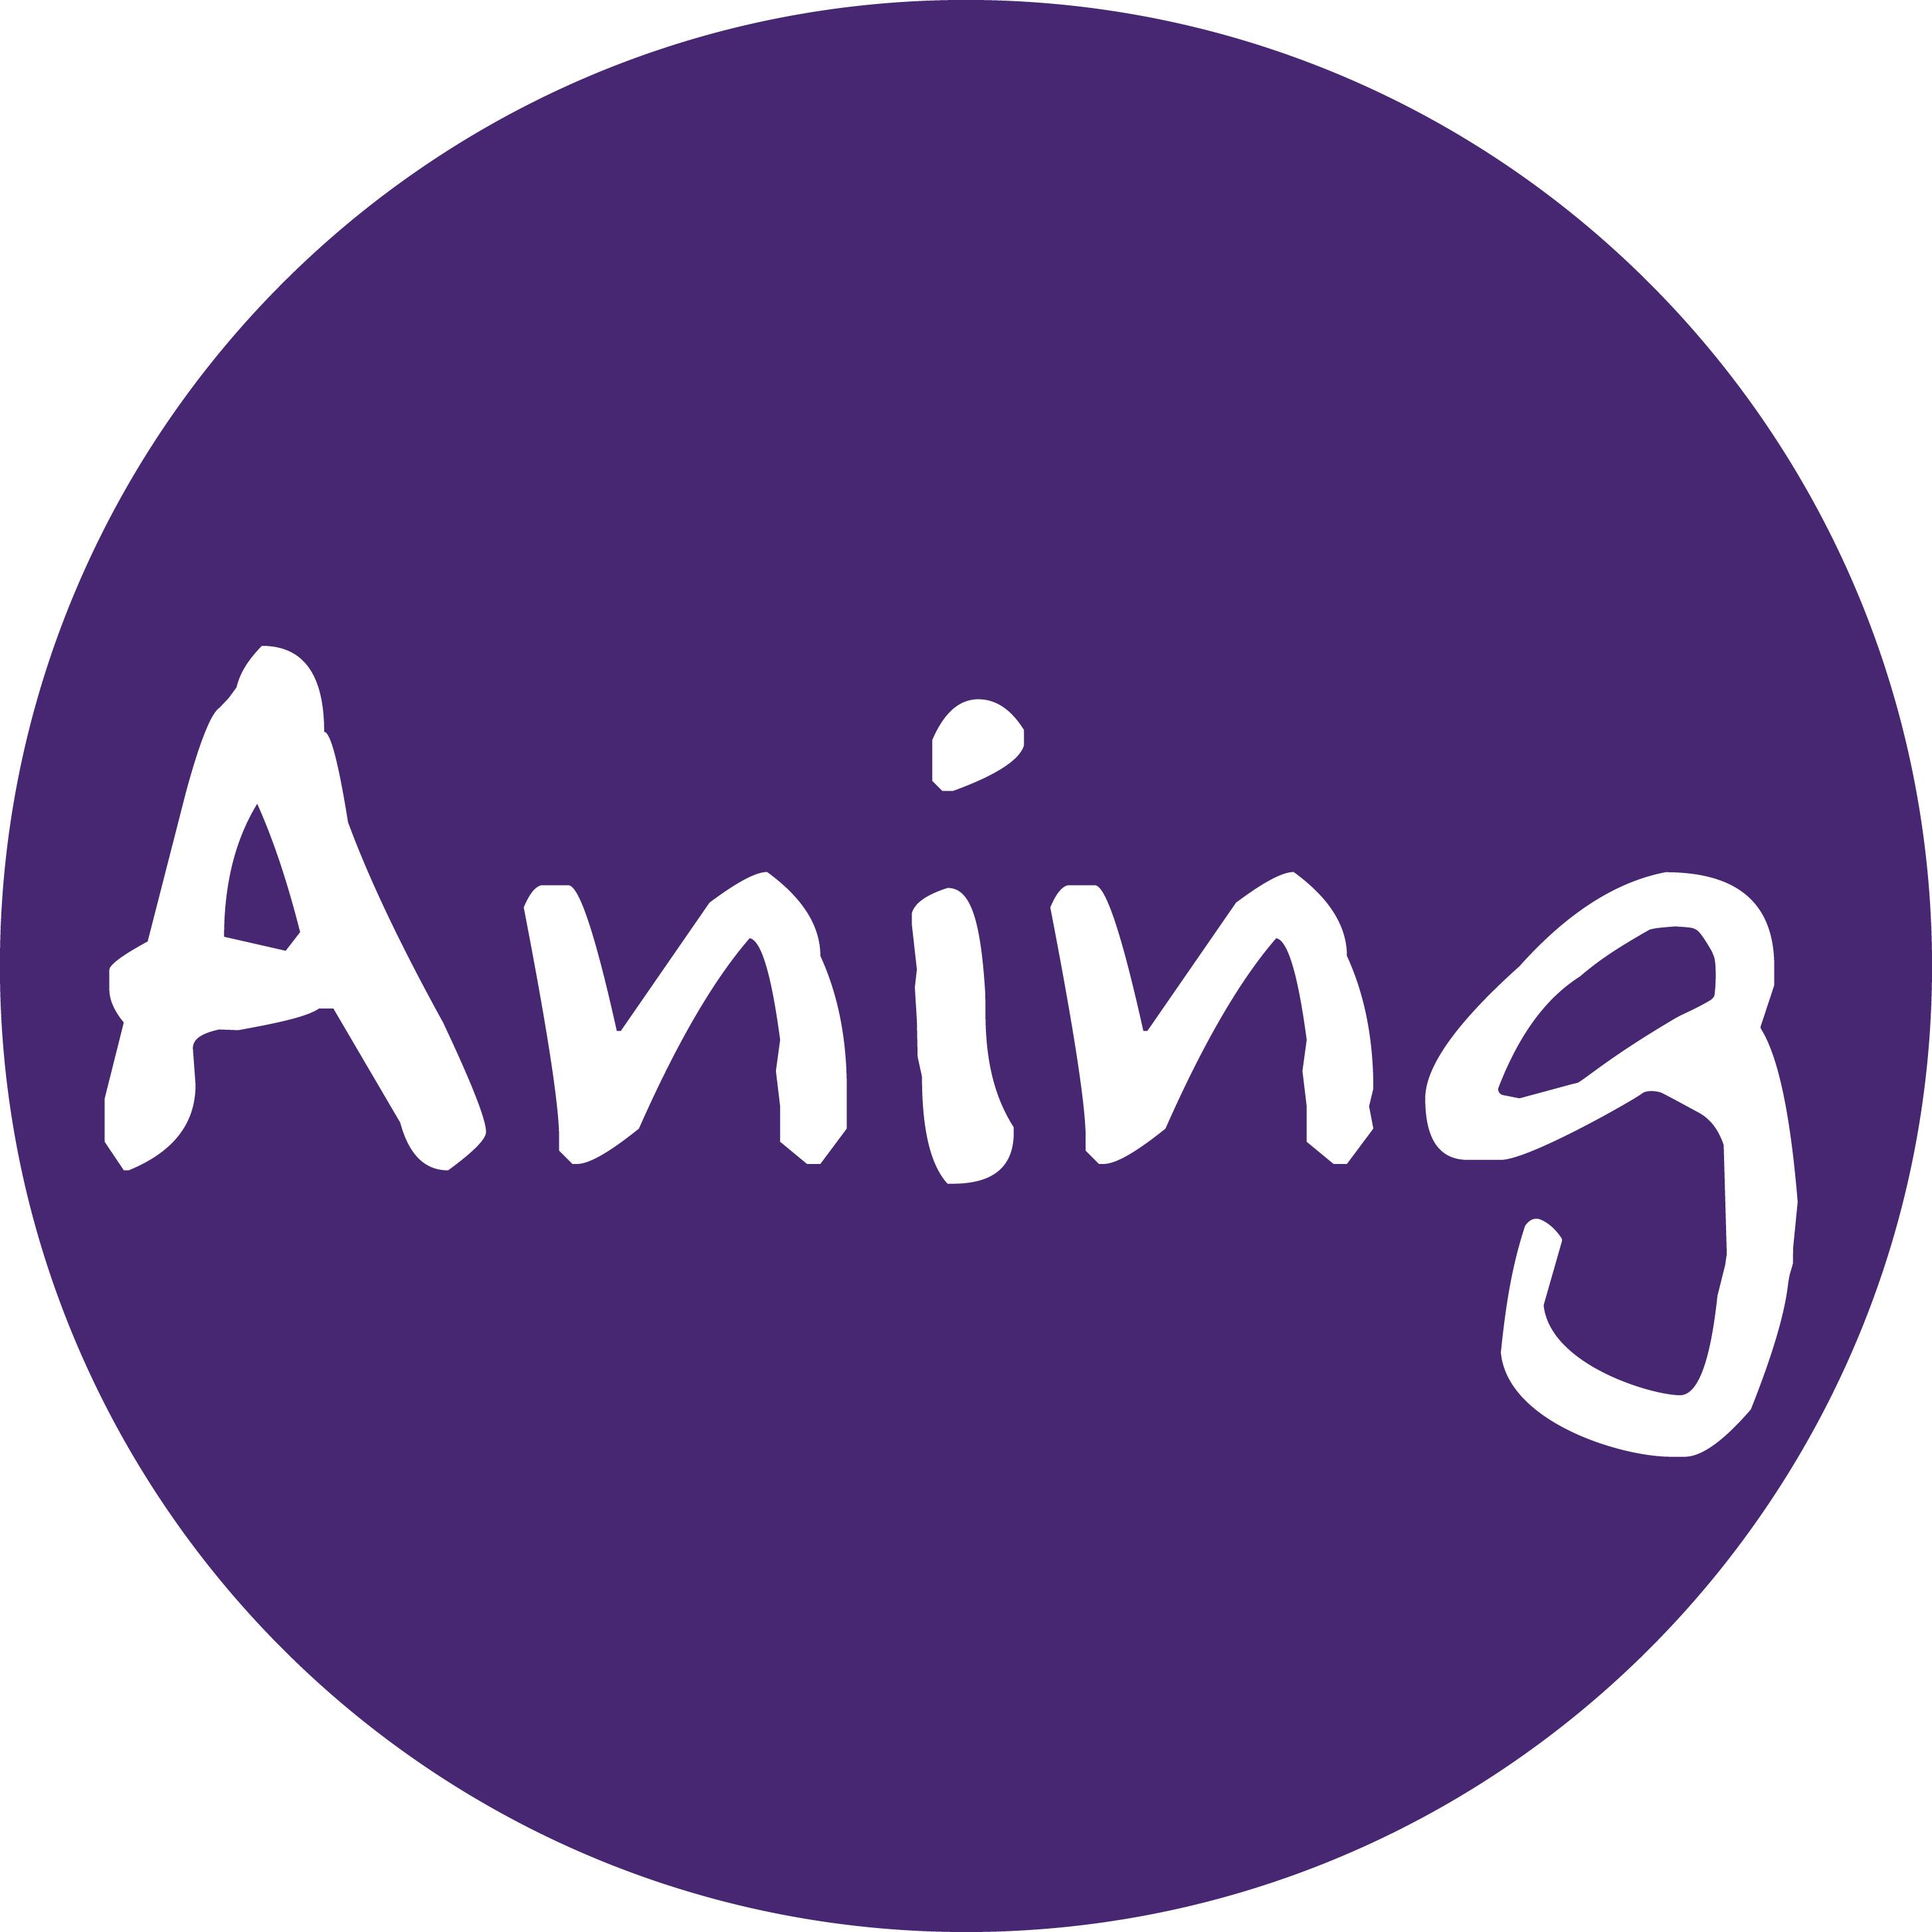 Aning